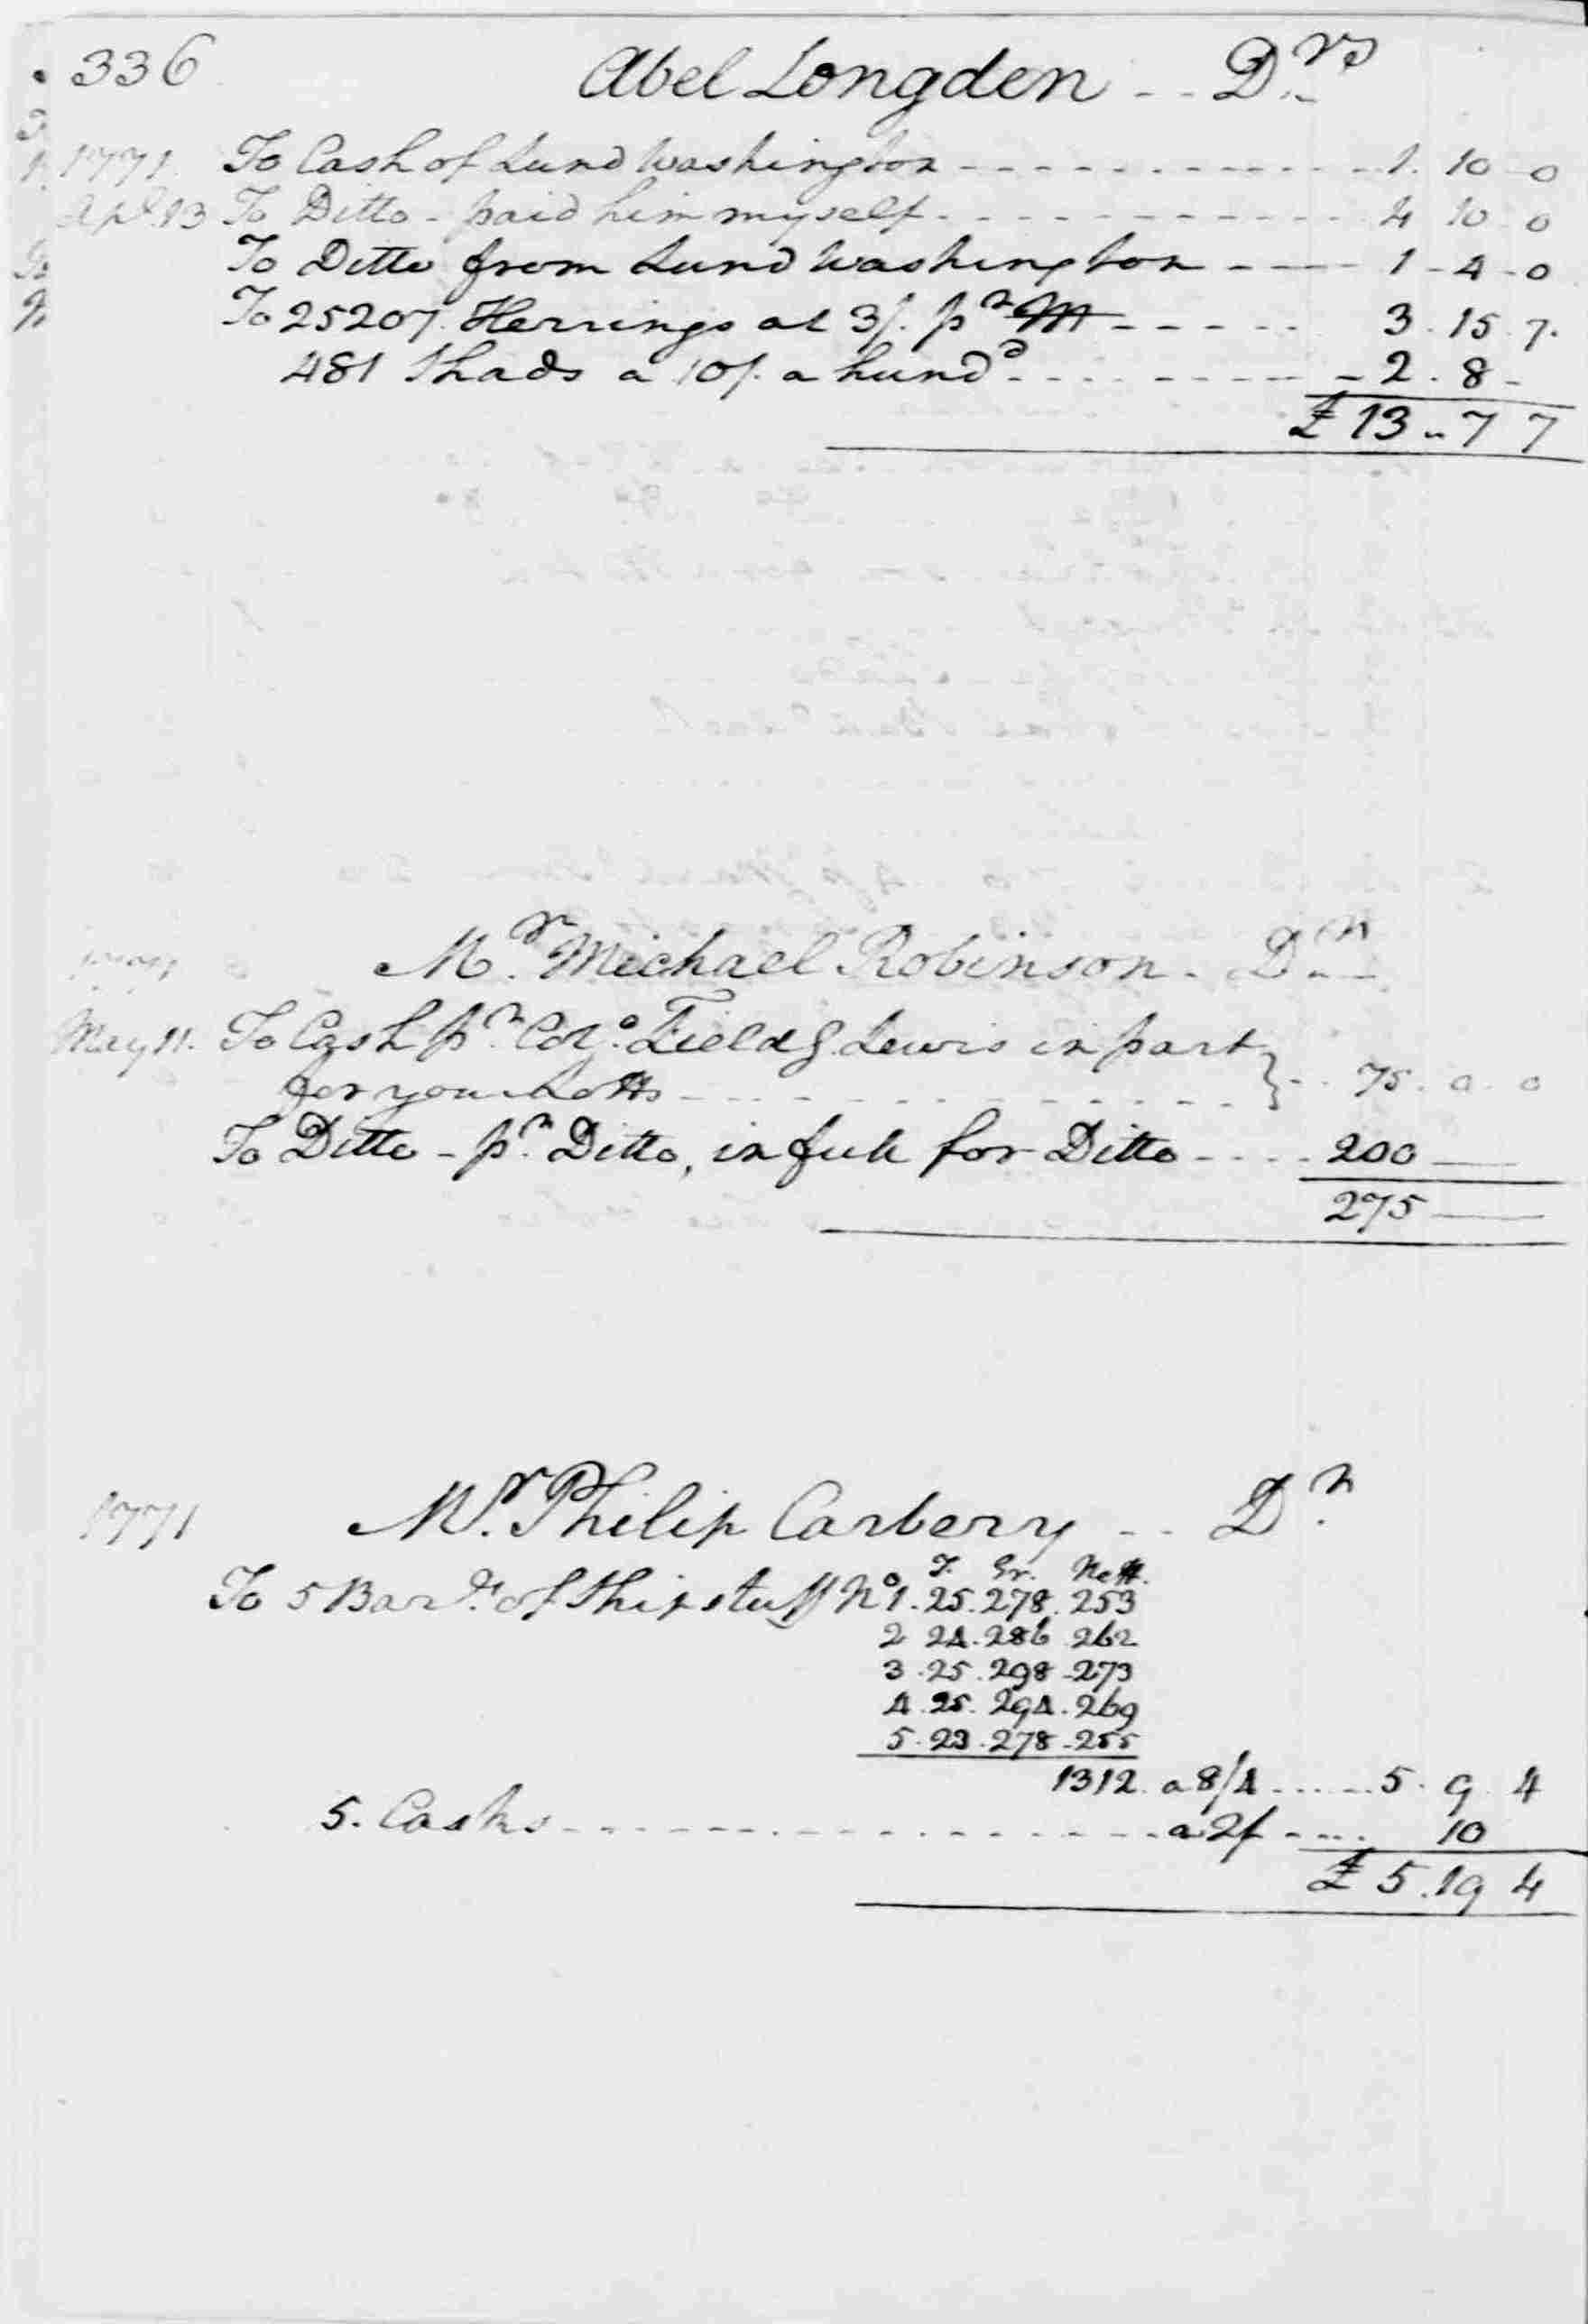 Ledger A, folio 336, left side